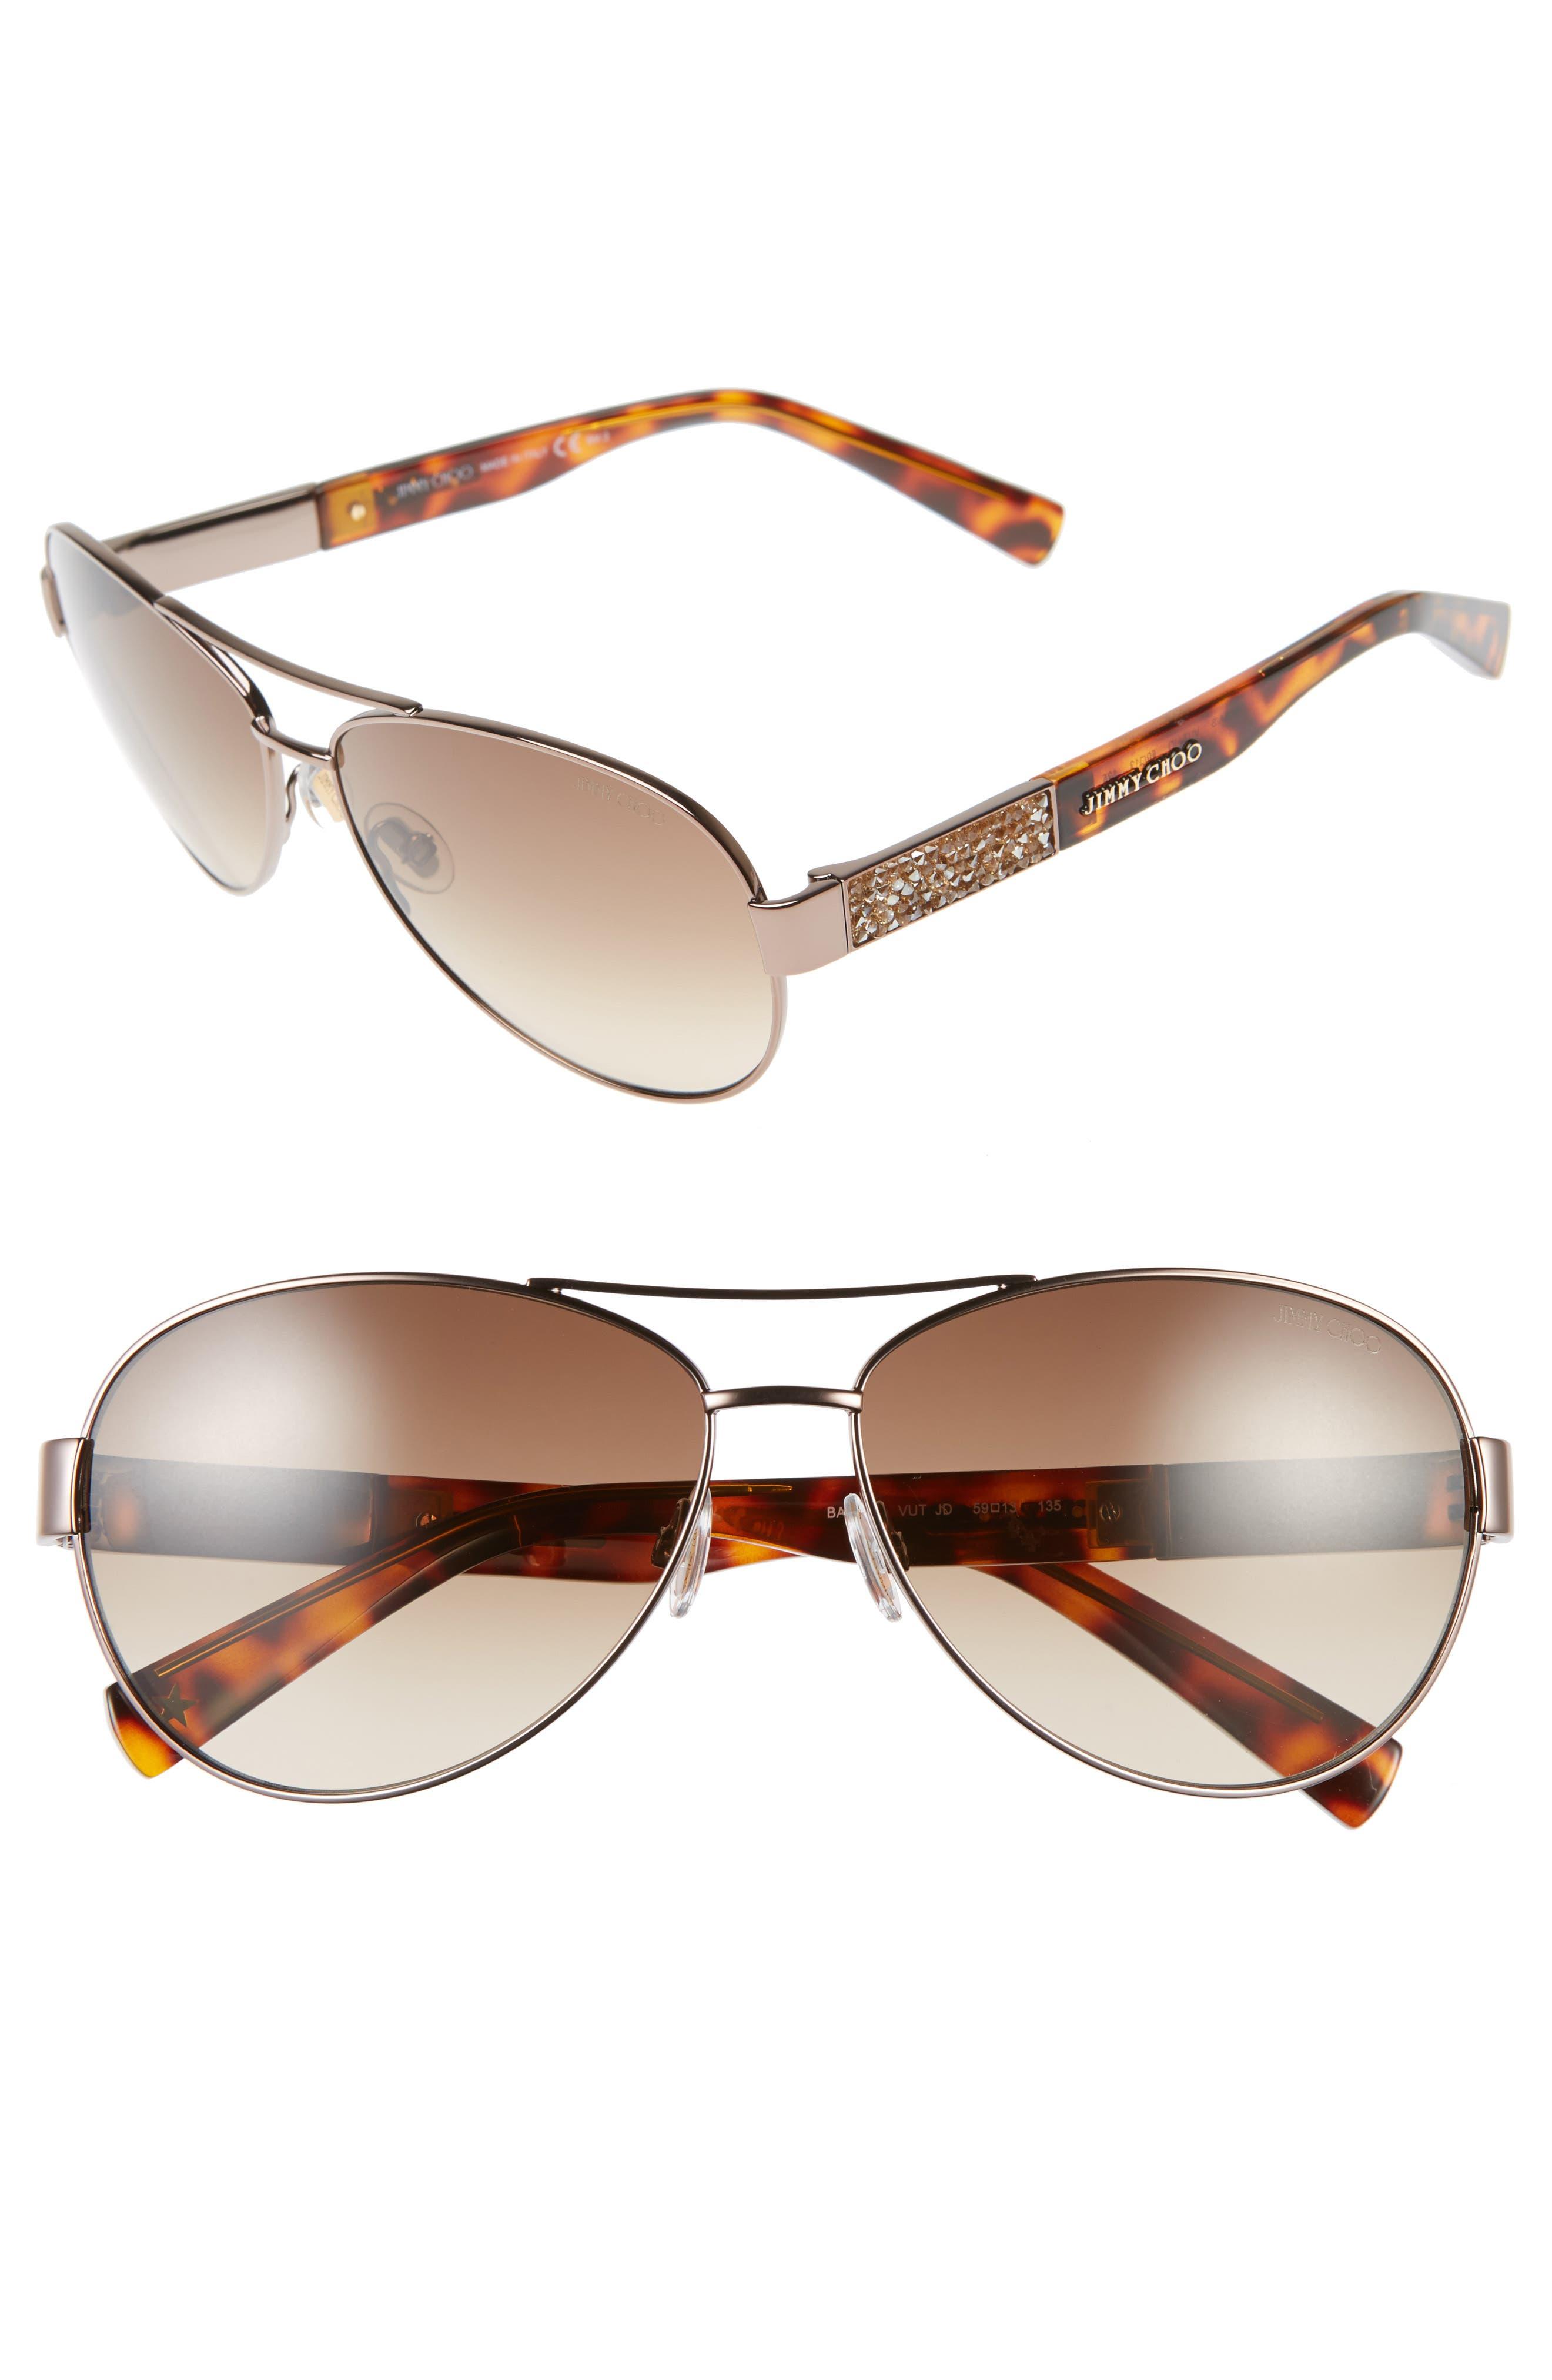 JIMMY CHOO,                             'Babas' 59mm Aviator Sunglasses,                             Alternate thumbnail 3, color,                             200